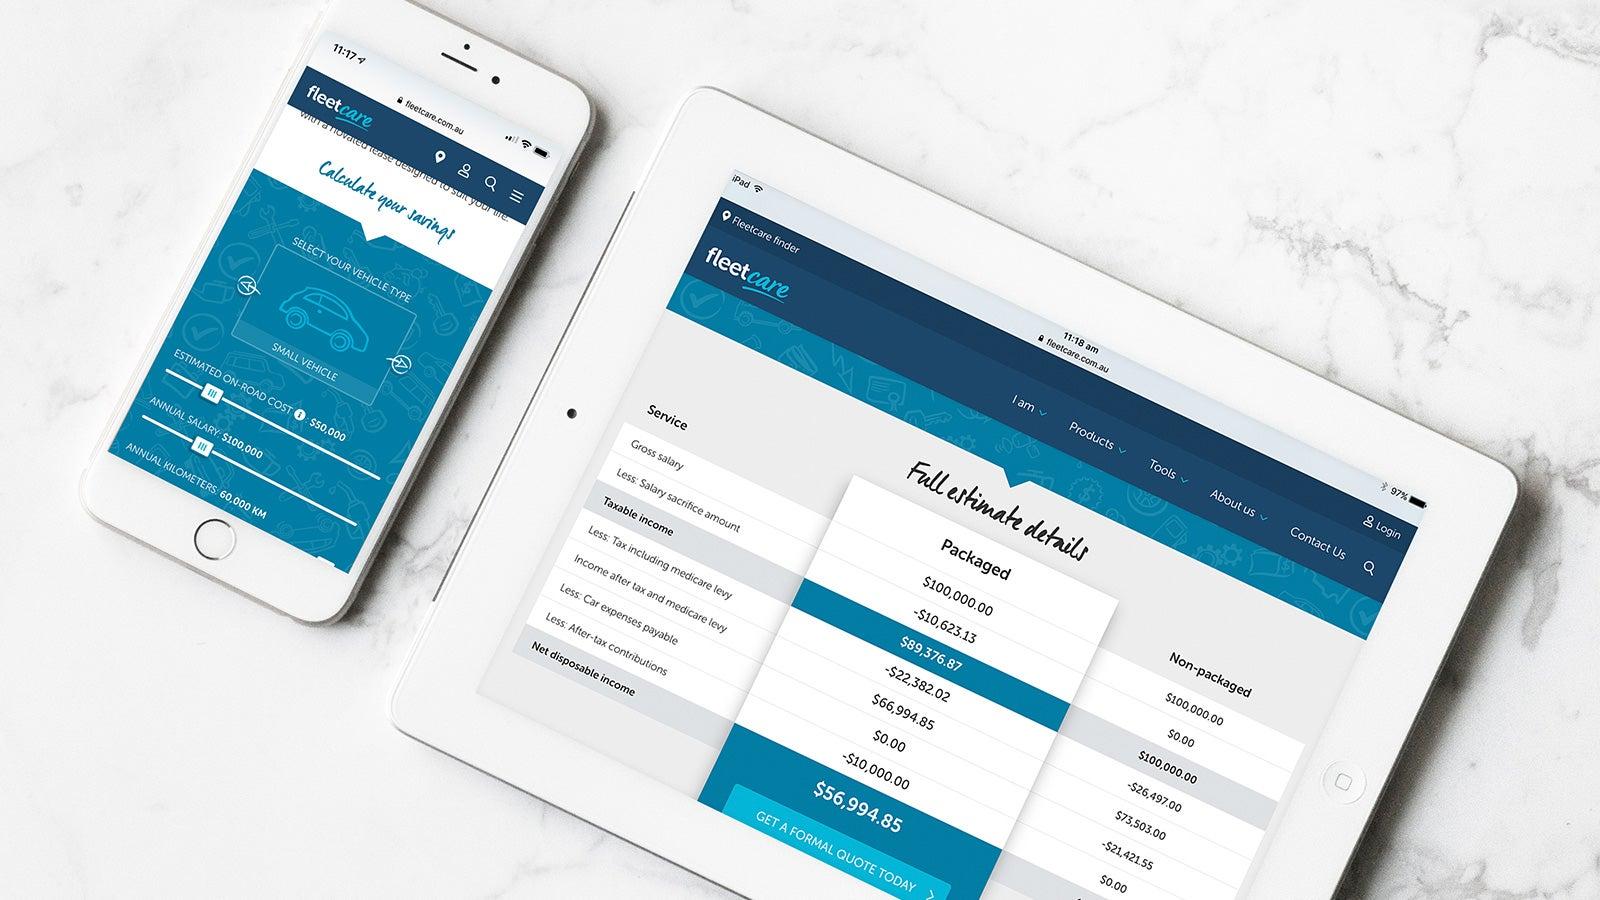 Fleetcare   Website novated solution calculator   Devotion